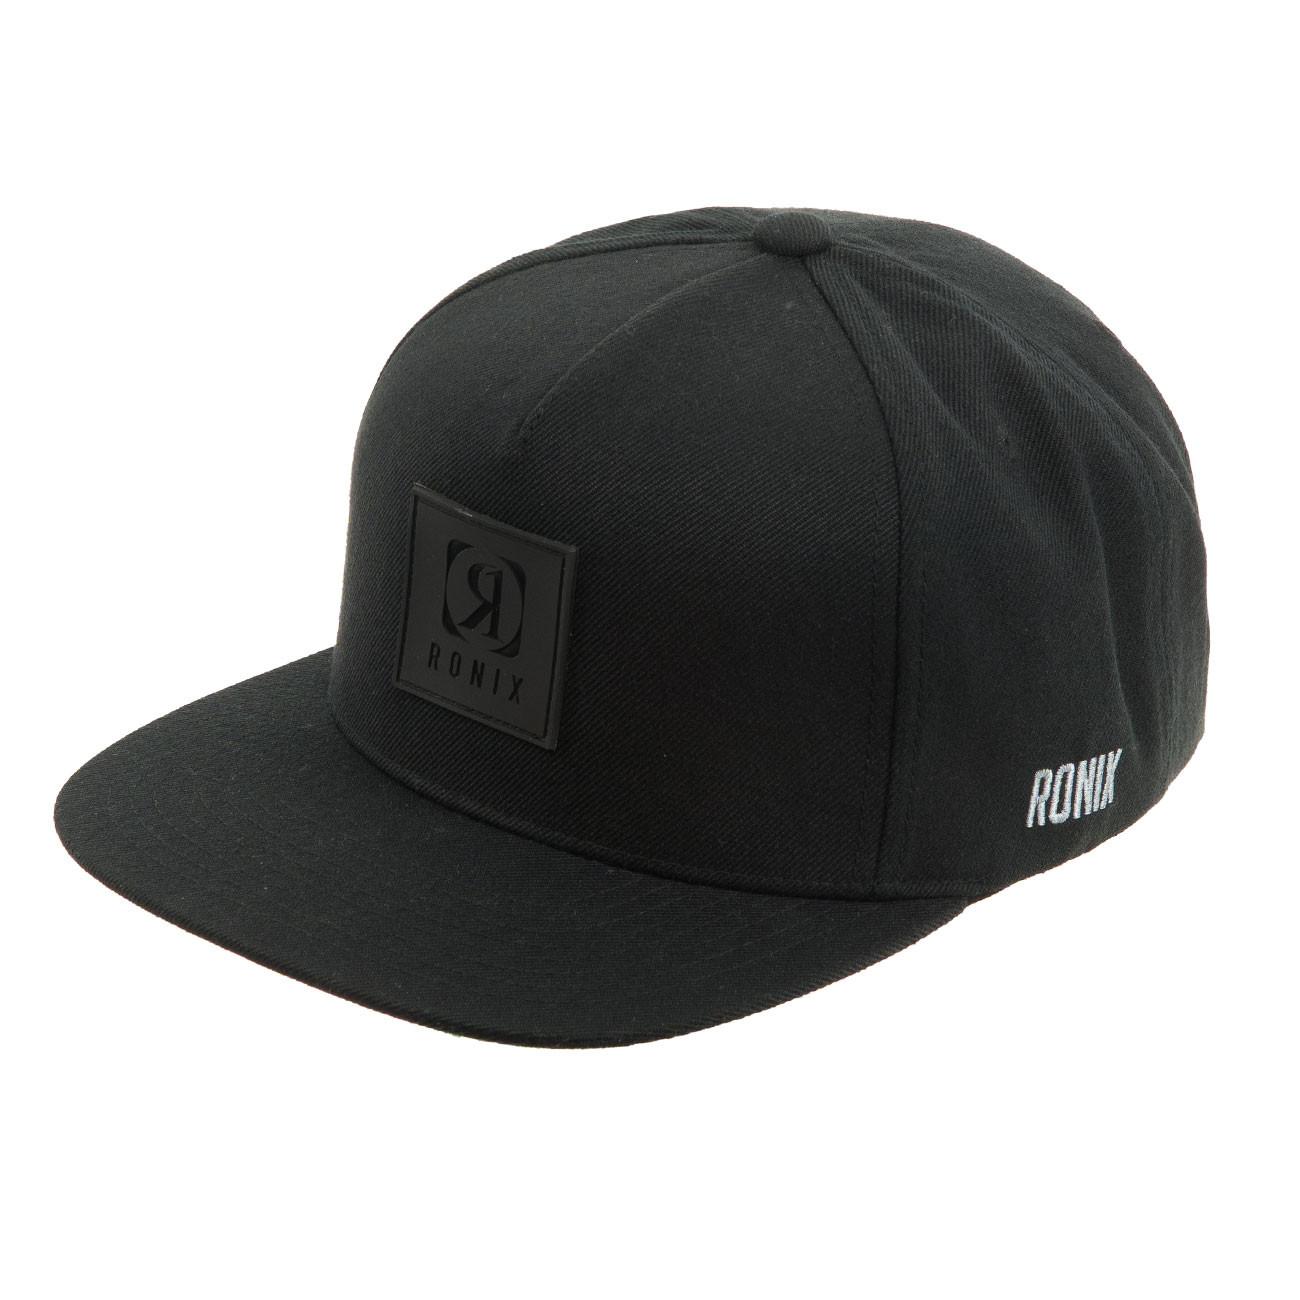 702f31d4fd3 Cap Ronix Darkside Snapback black